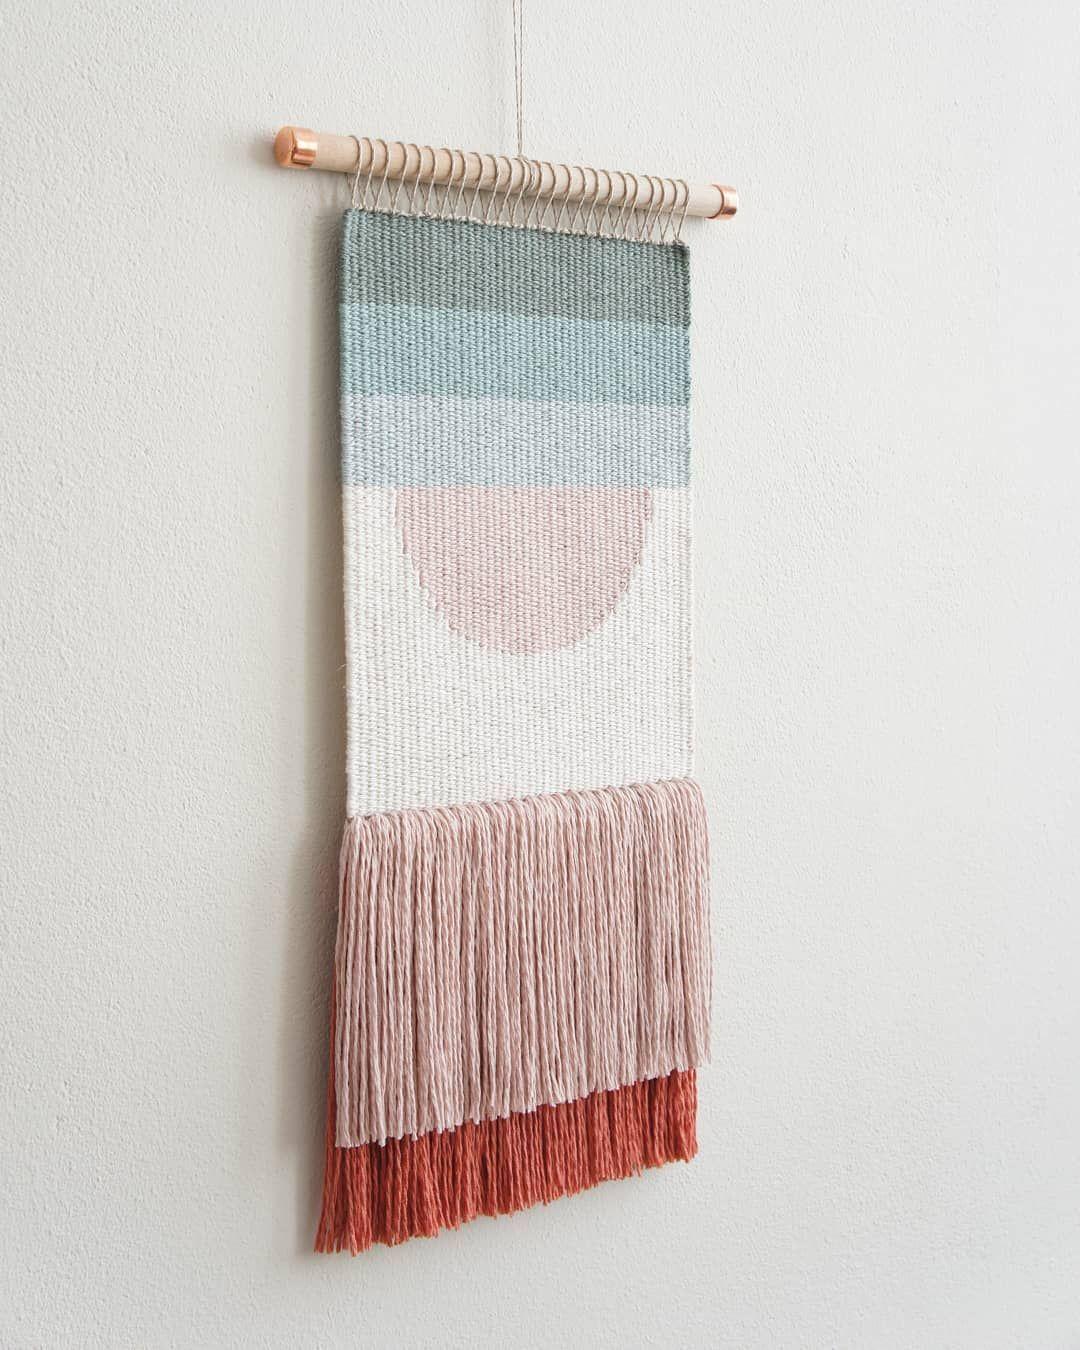 "kathrin   wednesdayweaving on Instagram: ""Update: SOLD! Happy March! 💐 . . #weaving #weaversofinstagram #weaverfever #woven #woventapestry #wovenwallhanging #wallhanging #wandbehang…"""